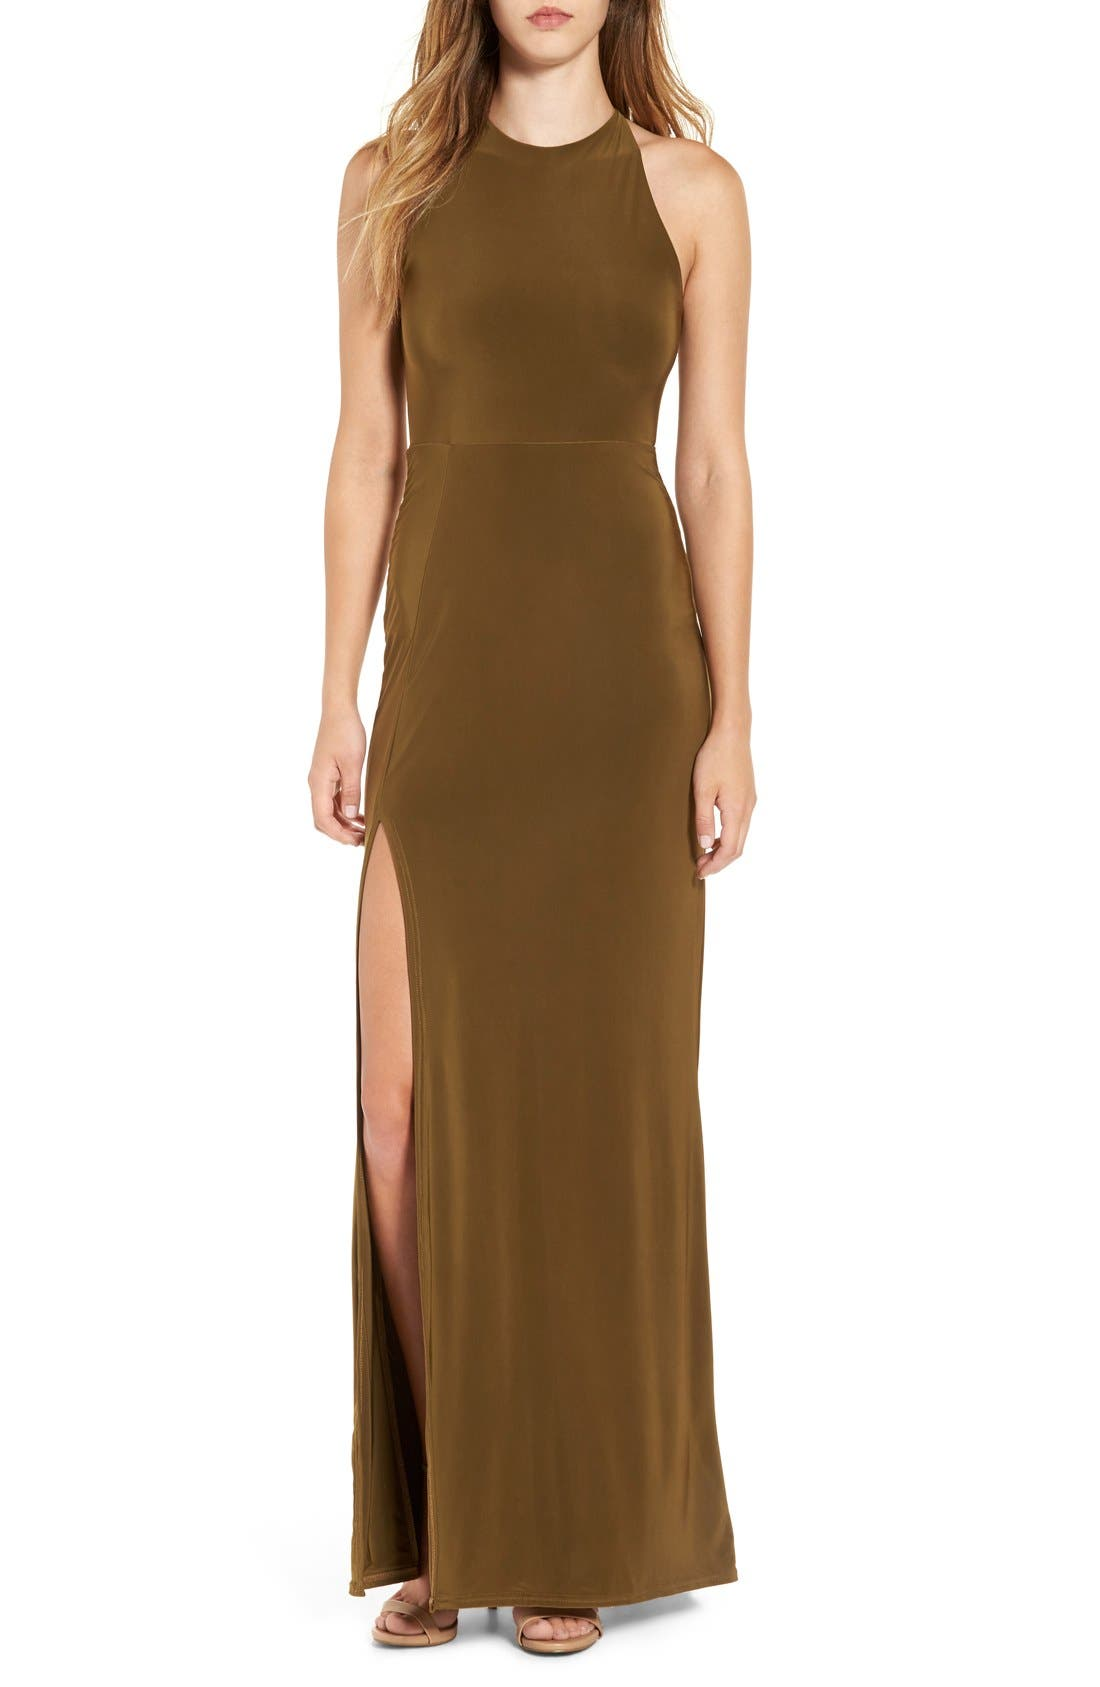 Strappy Back Maxi Dress,                             Main thumbnail 1, color,                             291